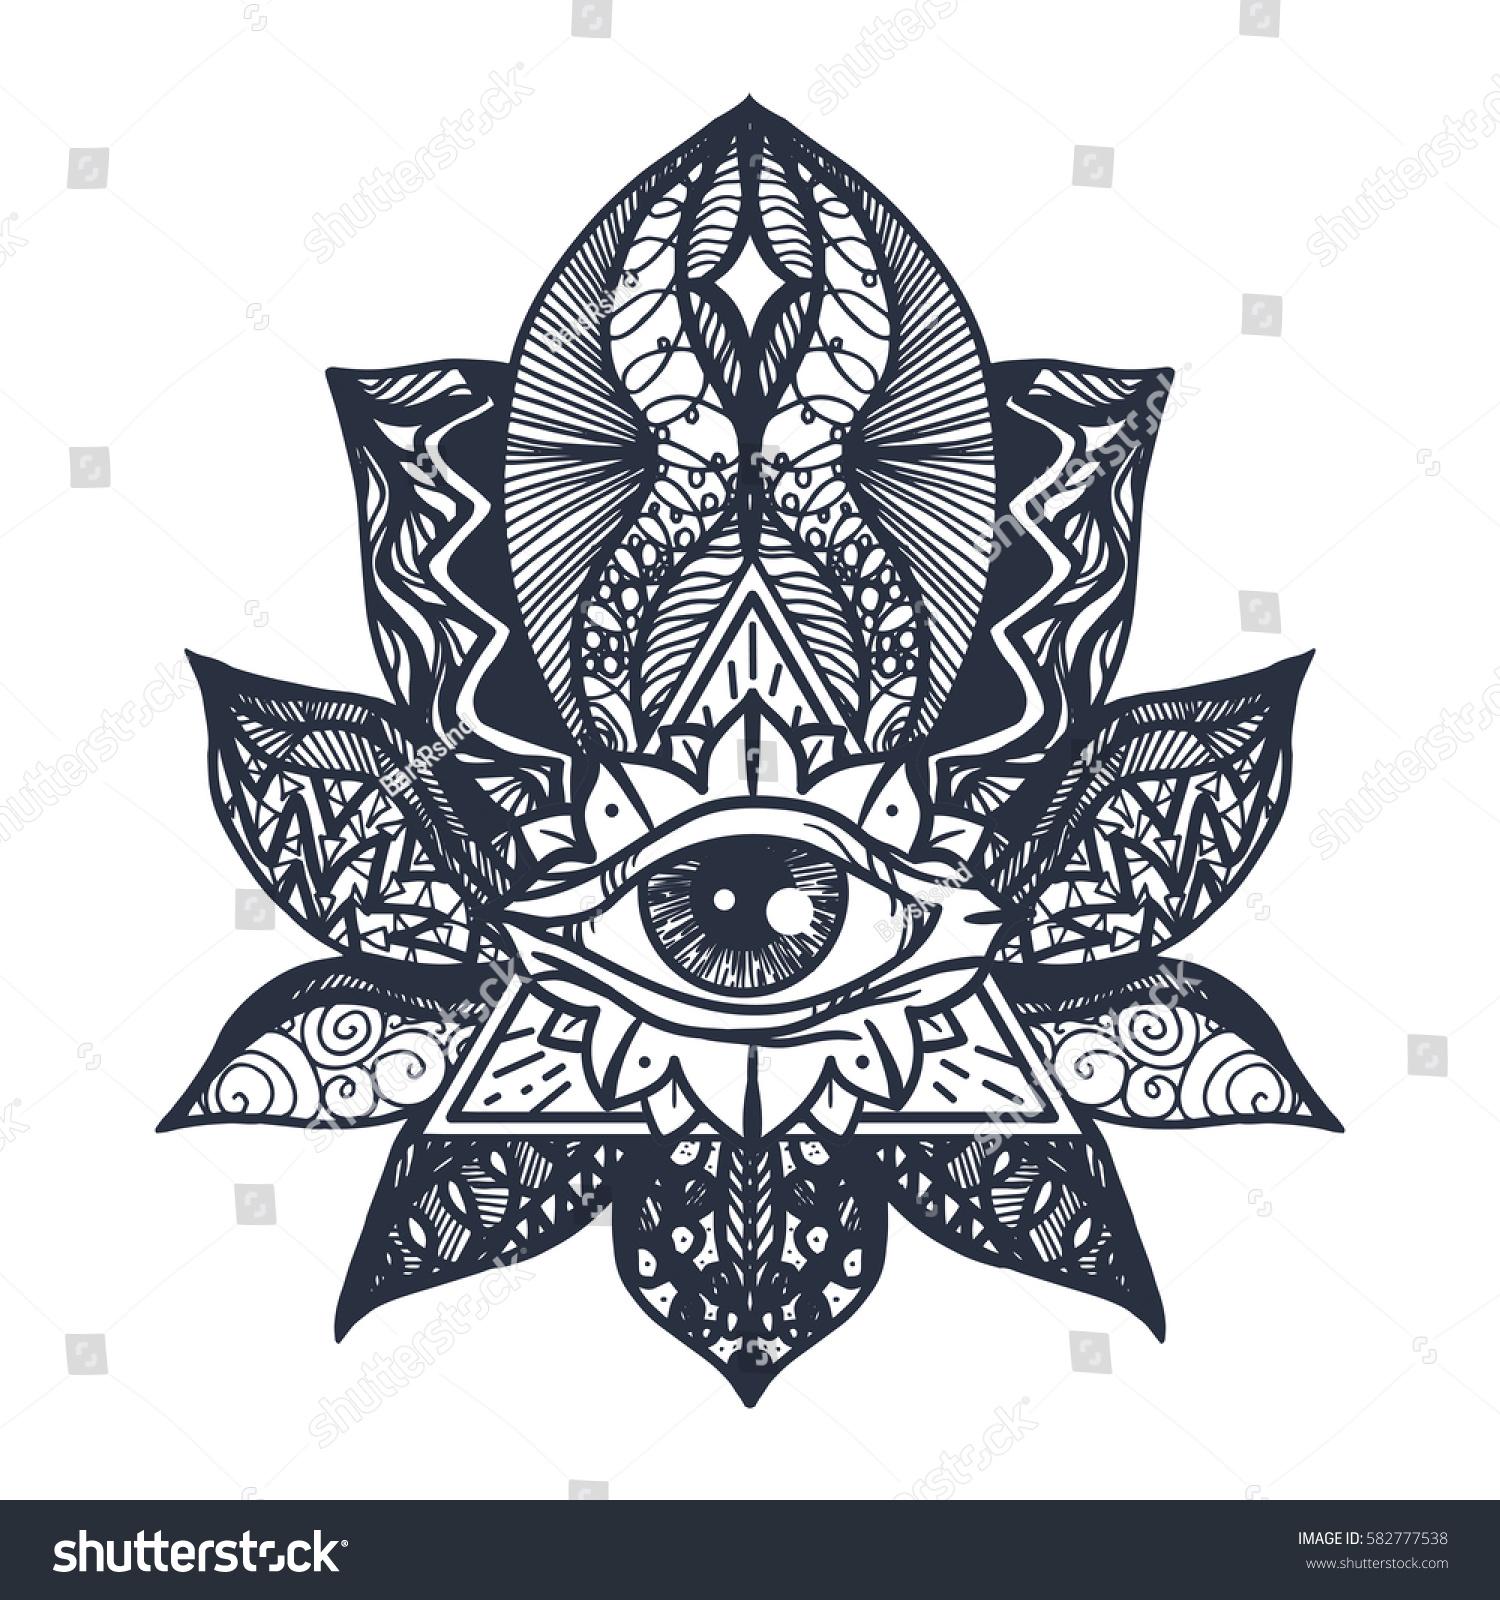 Vintage all seeing eye mandala lotus stock vector 582777538 vintage all seeing eye in mandala lotus providence magic symbol for print tattoo buycottarizona